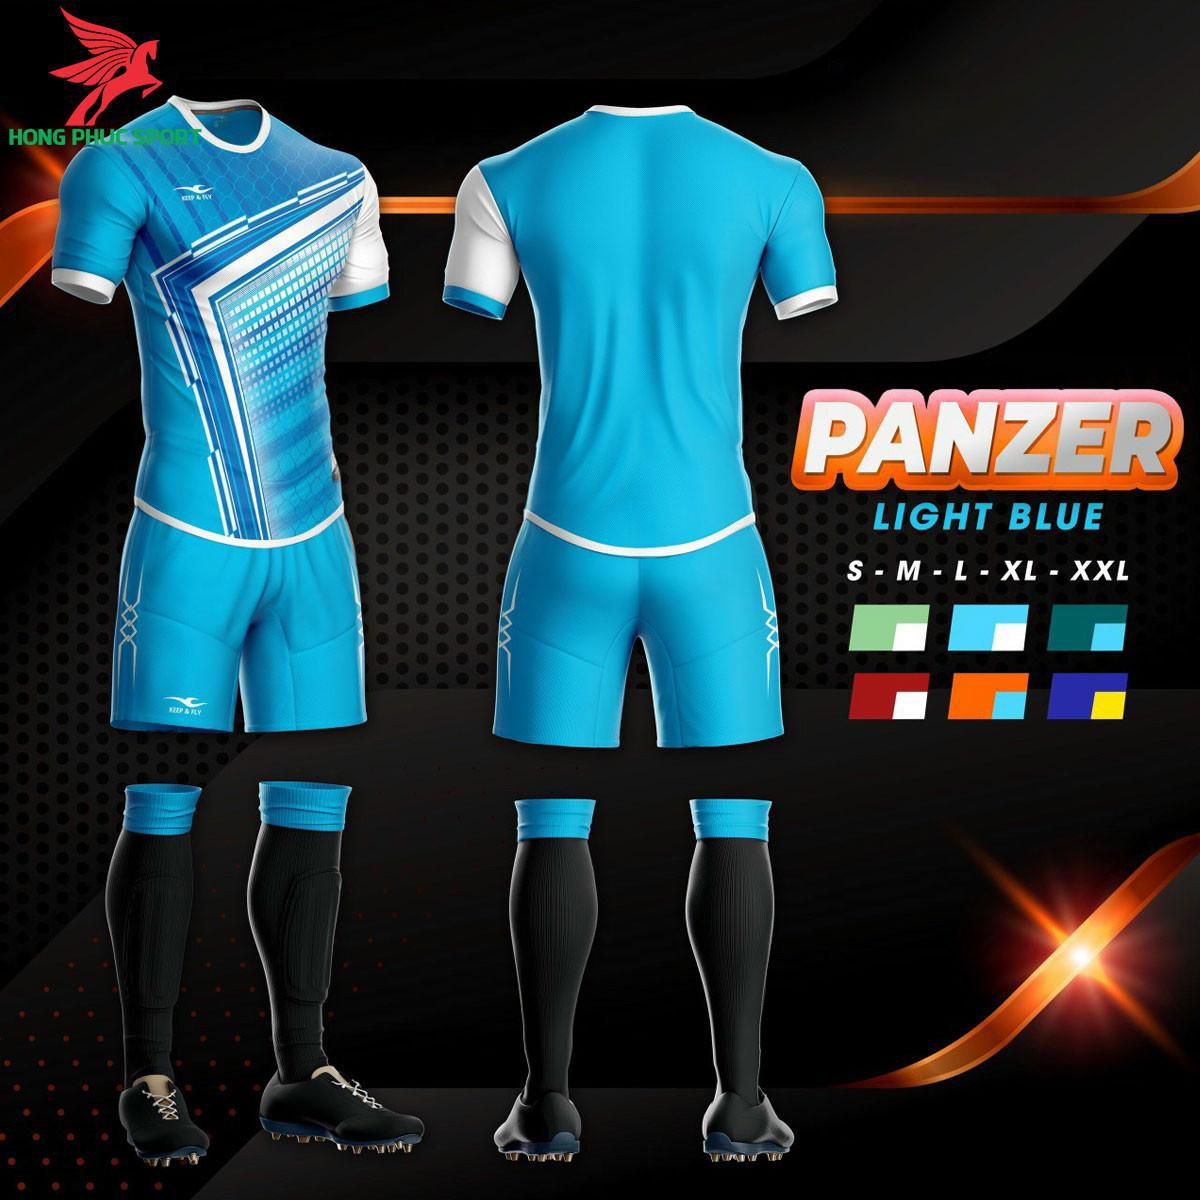 https://cdn.hongphucsport.com/unsafe/s4.shopbay.vn/files/285/ao-khong-logo-keep-fly-panzer-2021-mau-xanh-da-troi-603ef31dec07b.jpg